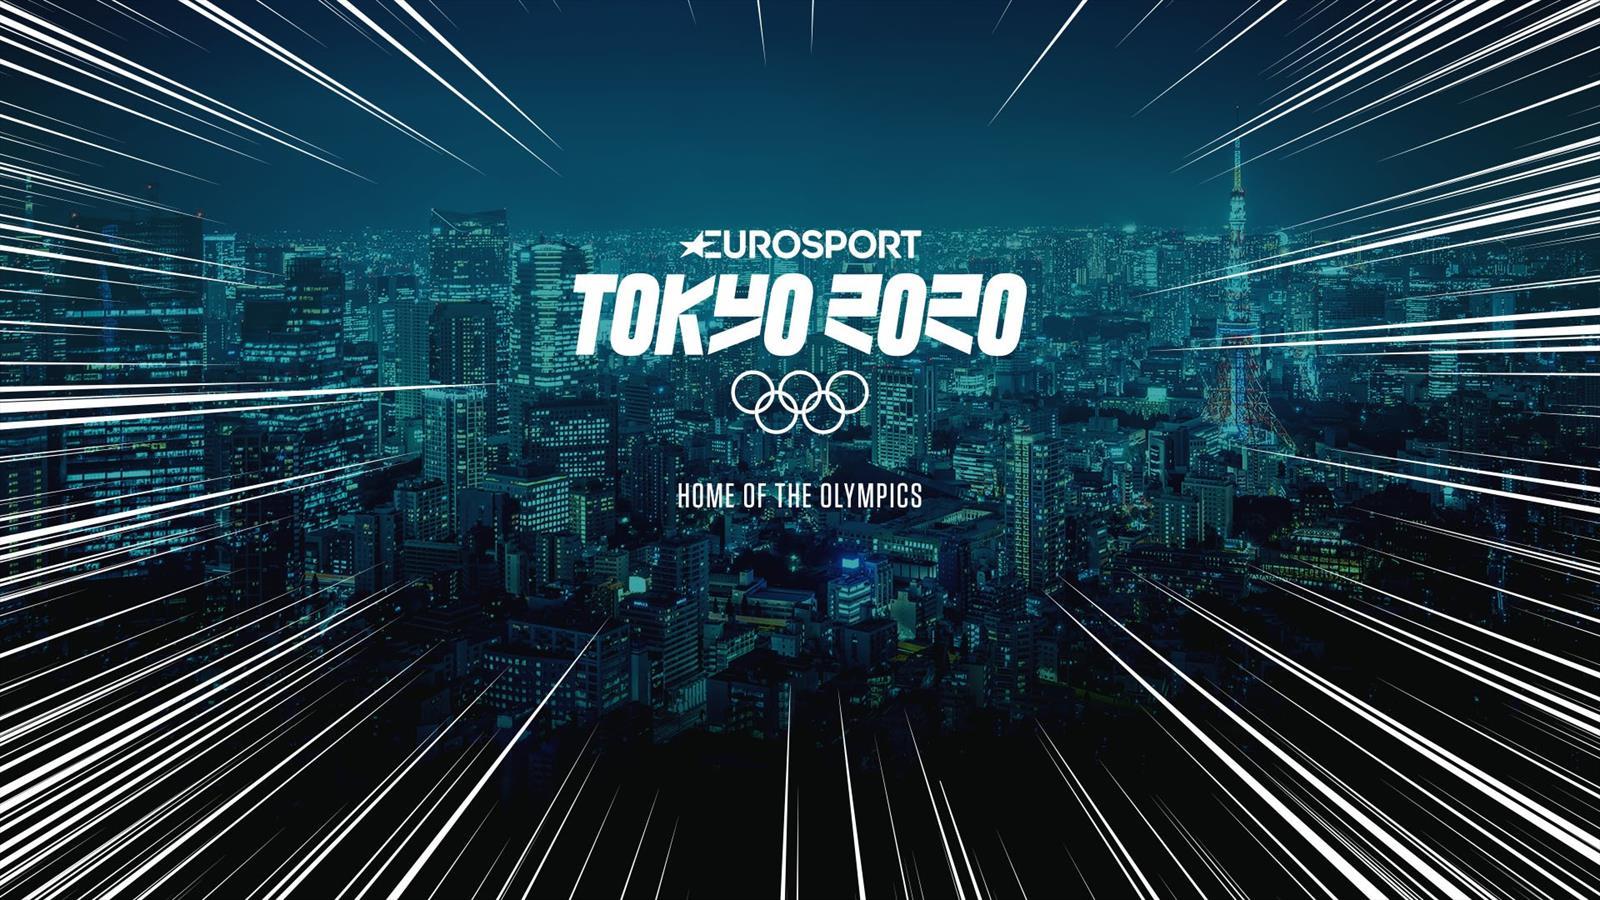 Calendario Serie B 2020 2020.Olympics News Eurosport S Manga Inspired Brand Identity